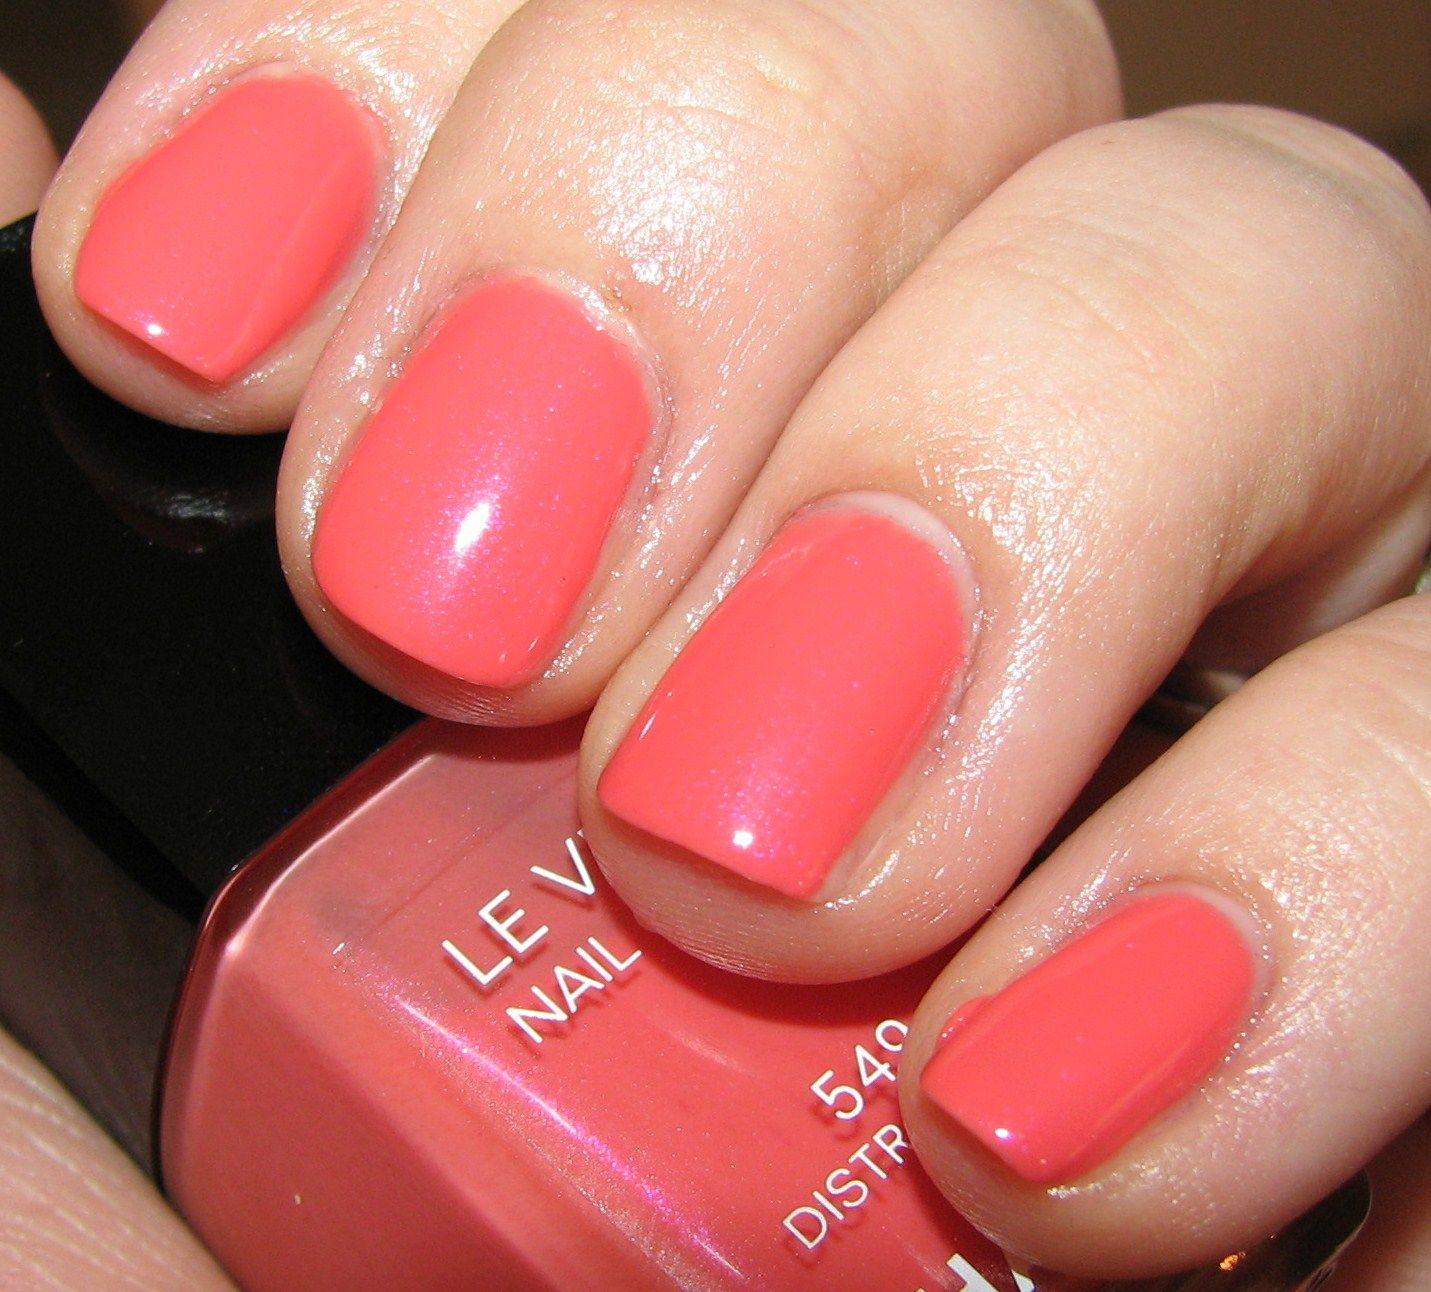 Vernis Nail: Chanel DISTRACTION 549 Nail Polish Swatches And Review